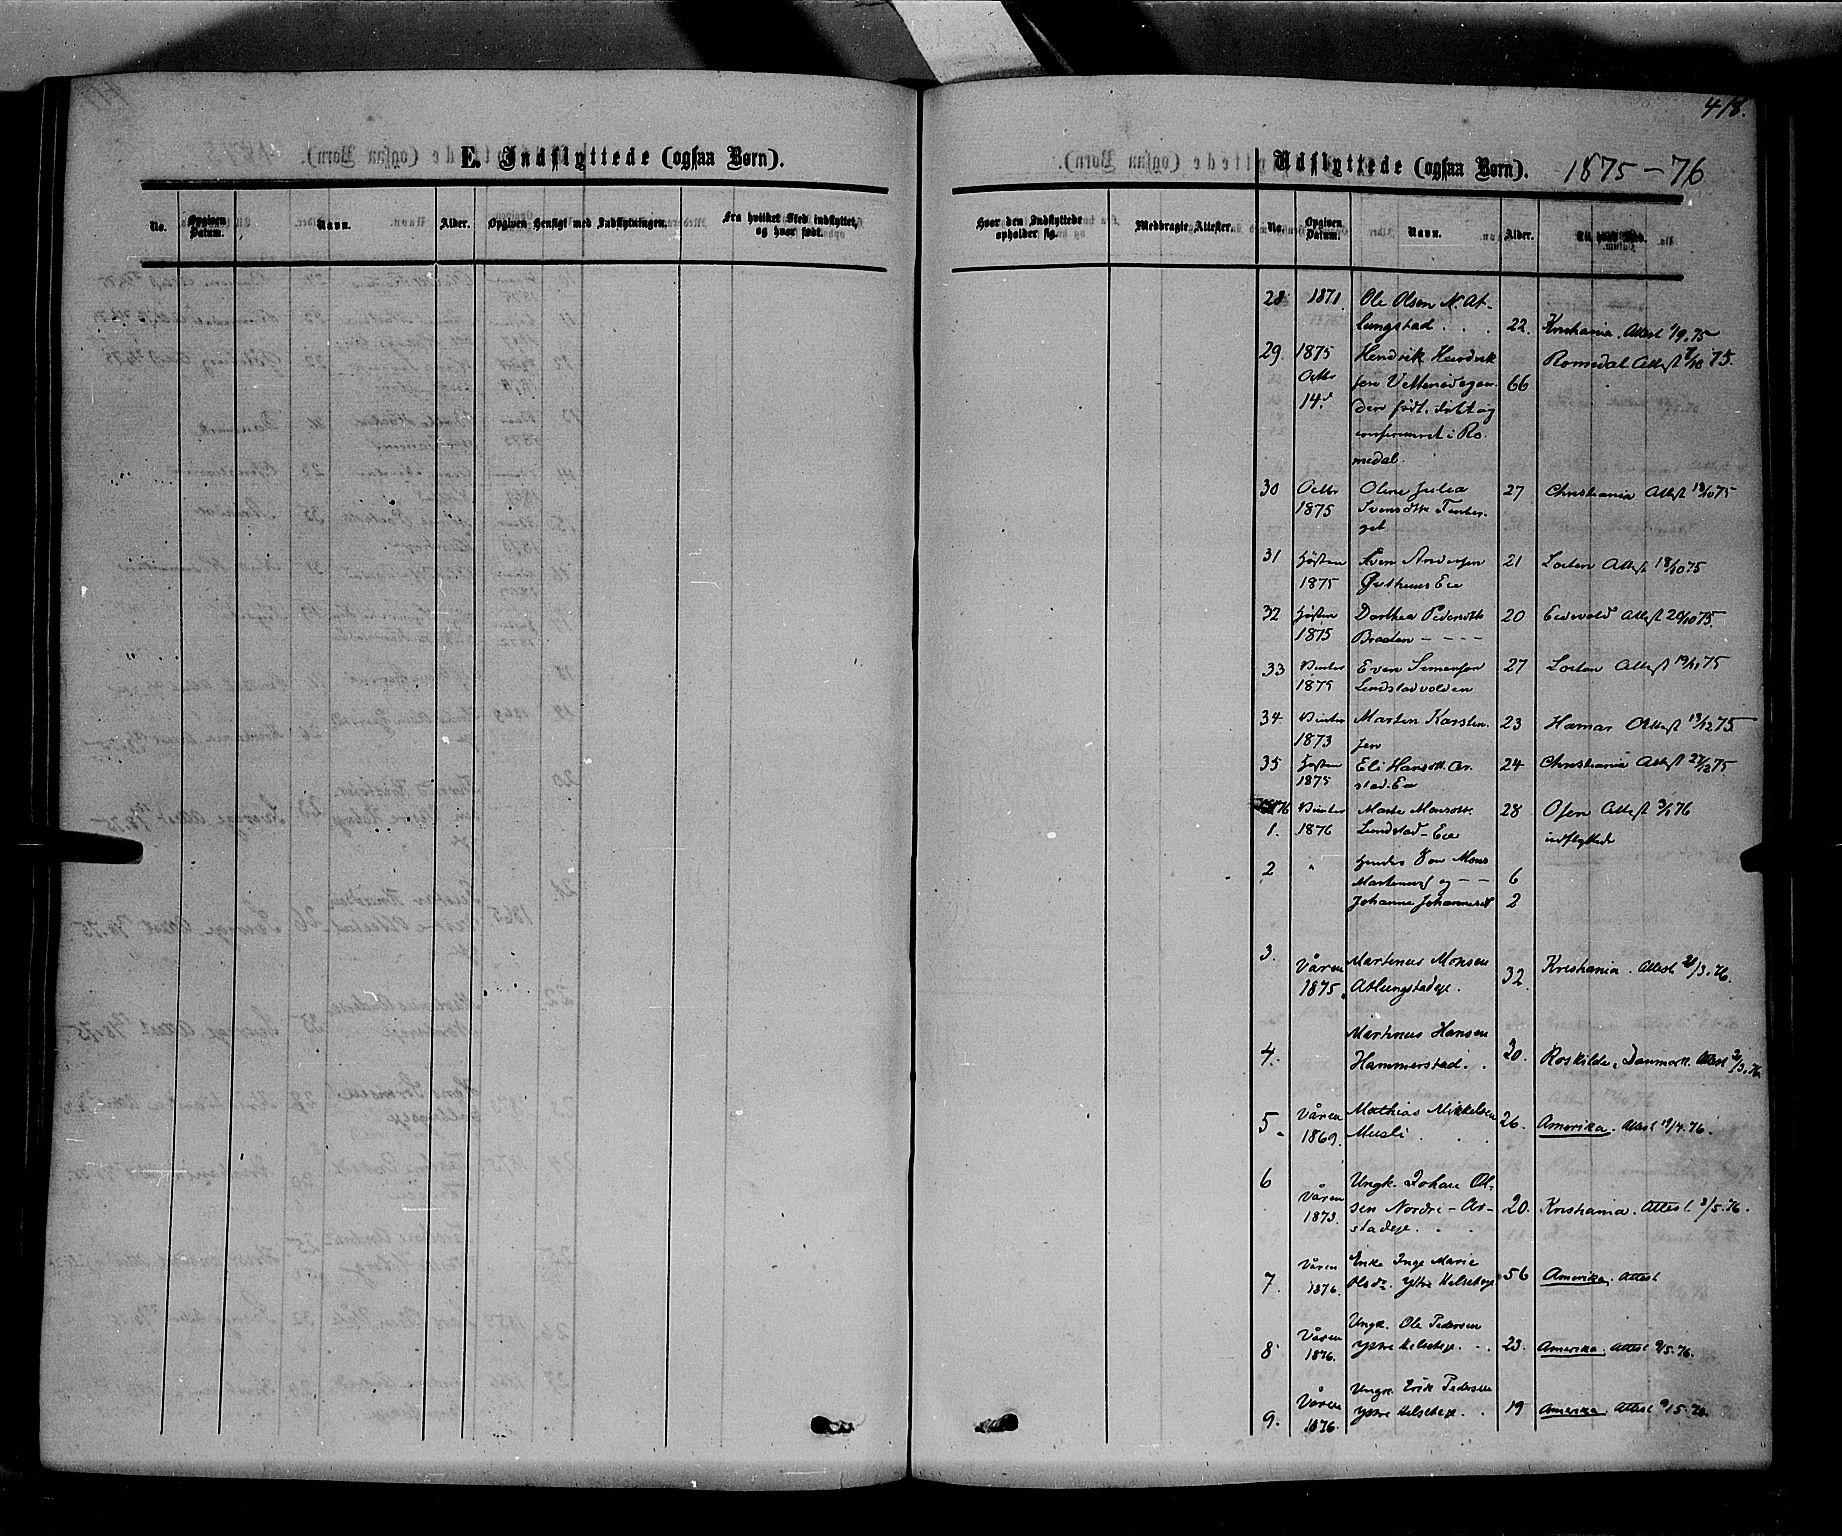 SAH, Stange prestekontor, K/L0013: Ministerialbok nr. 13, 1862-1879, s. 418